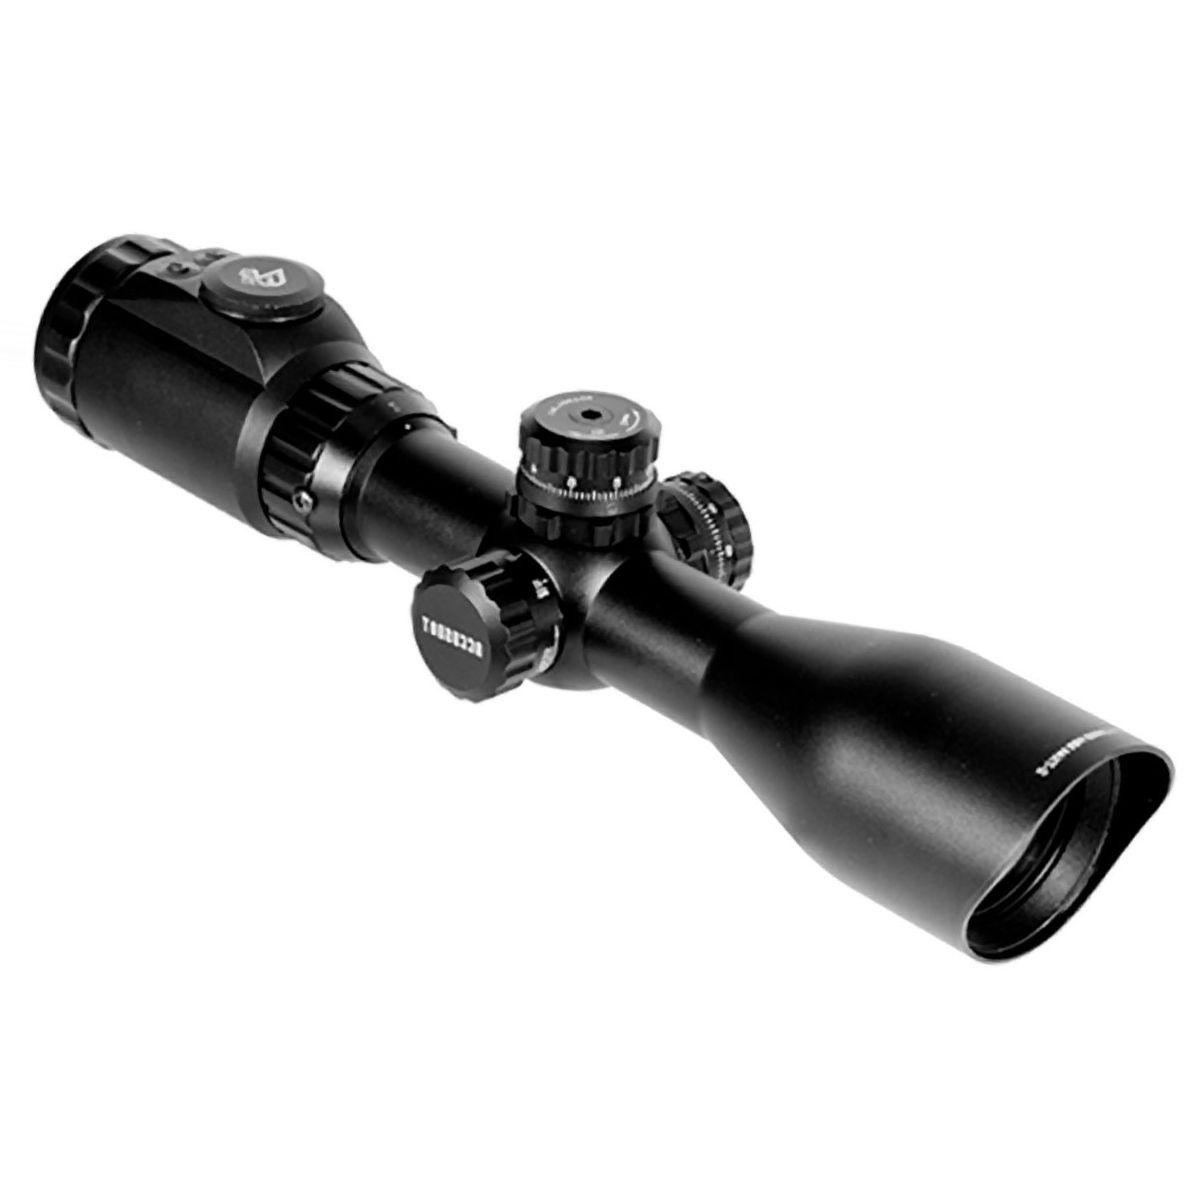 UTG 2-7x44 30mm Long Eye Relief Scout Riflescope